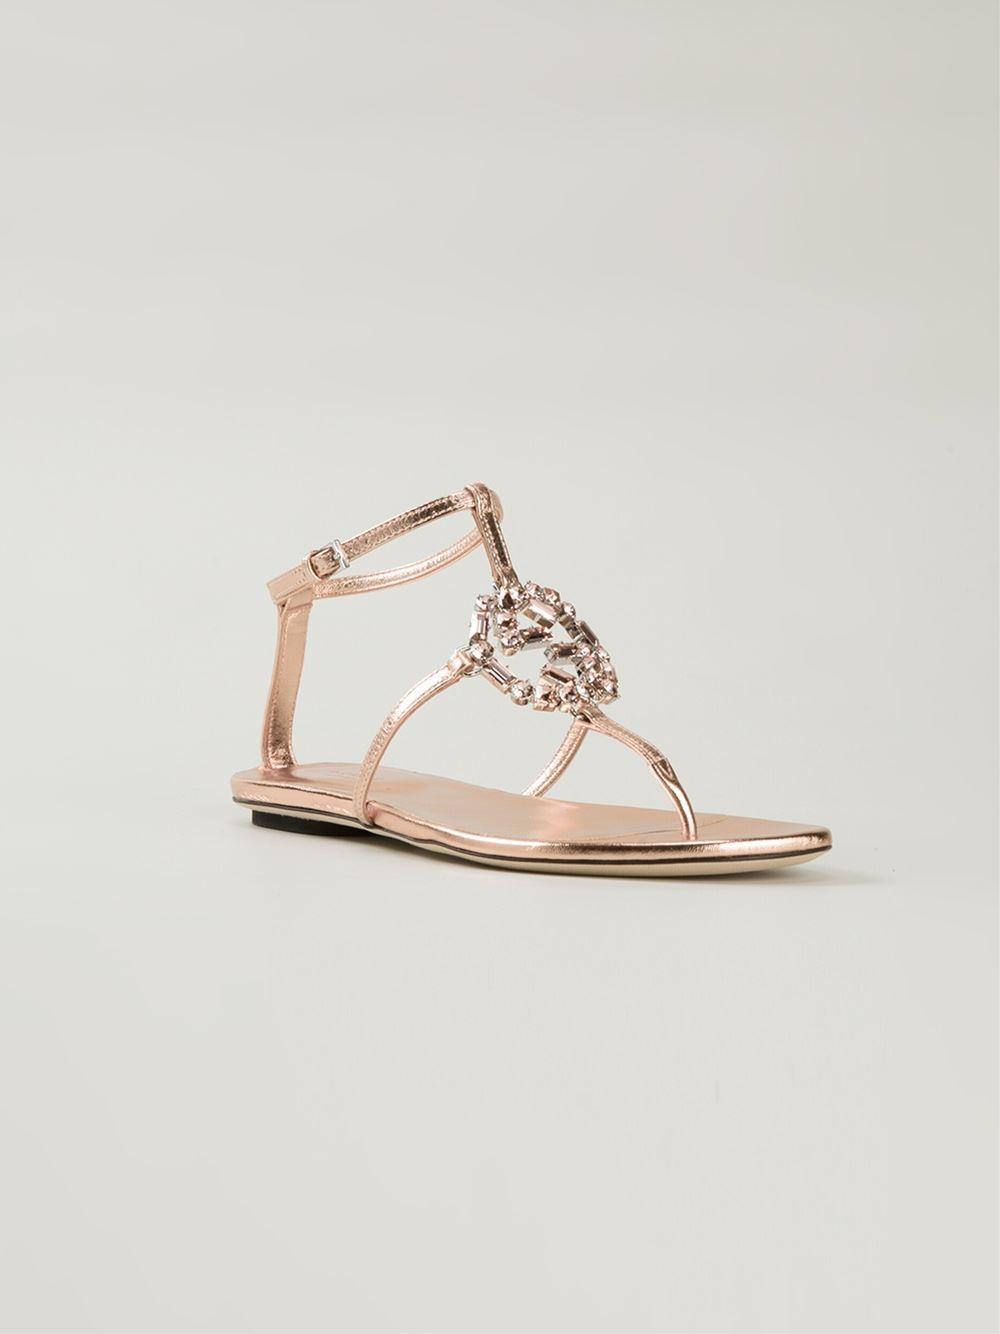 28843ab28b81 Lyst - Gucci  gg  Flat Sandals in Pink